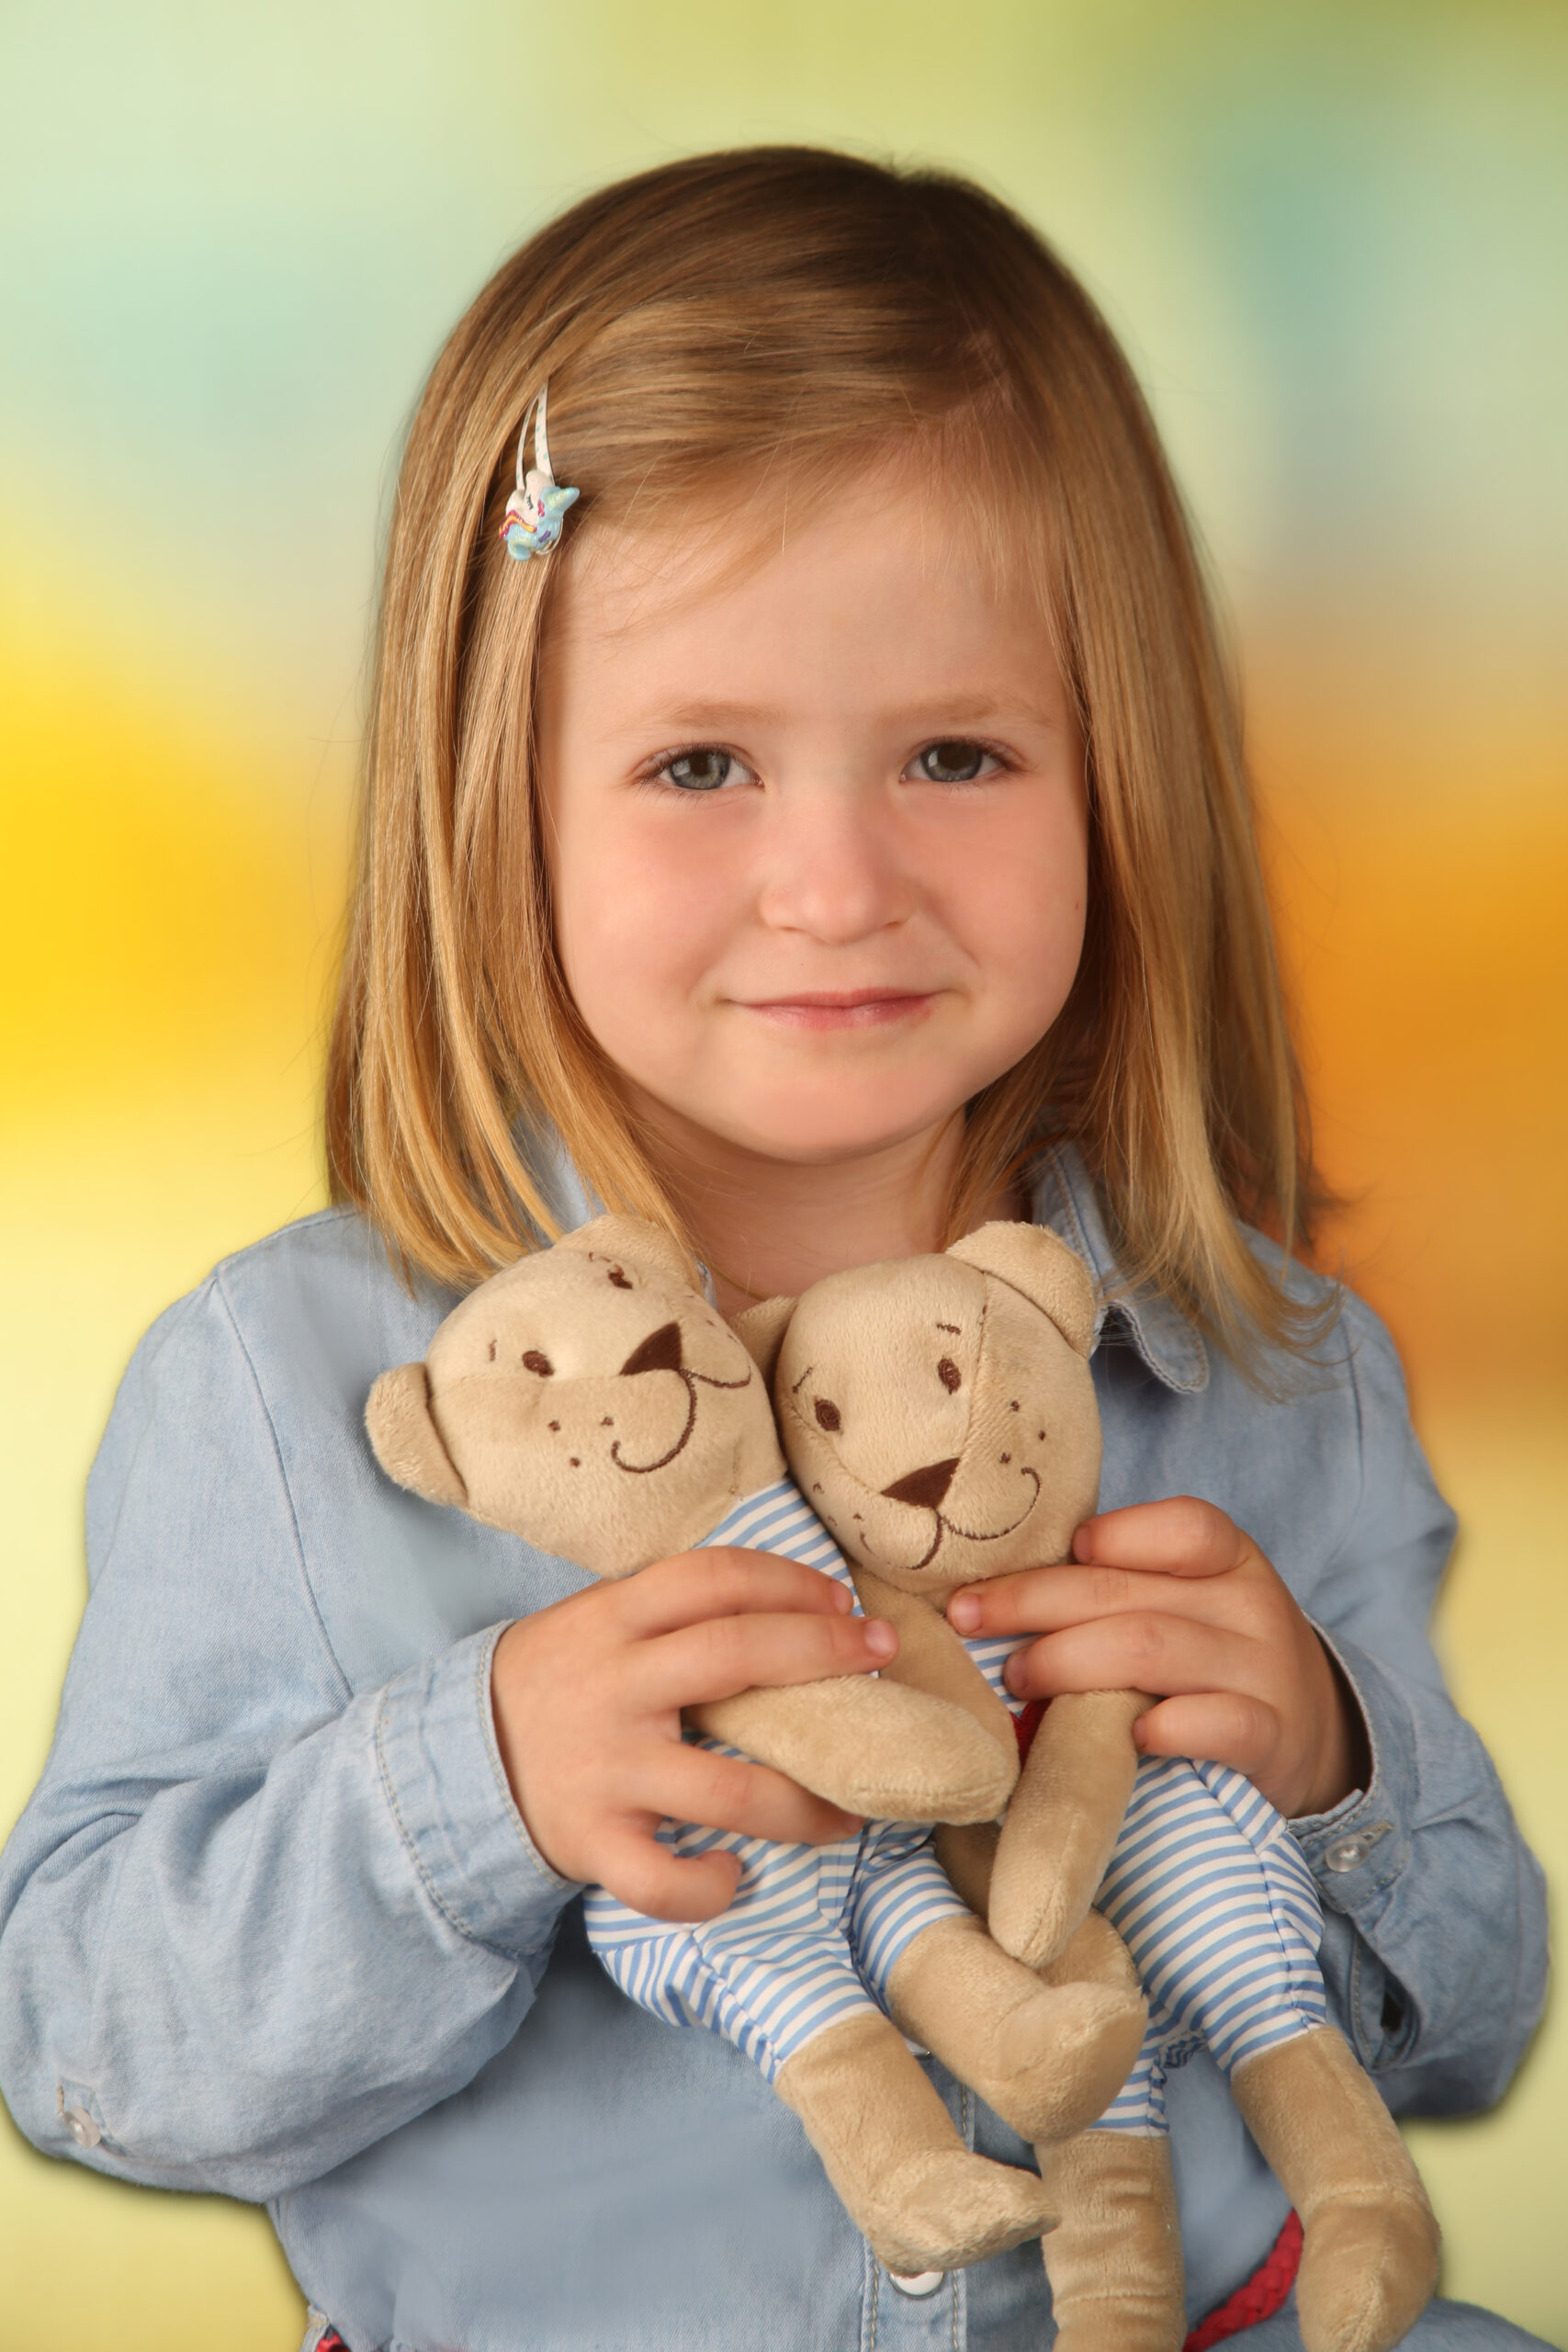 Kinderfoto mit Teddybären